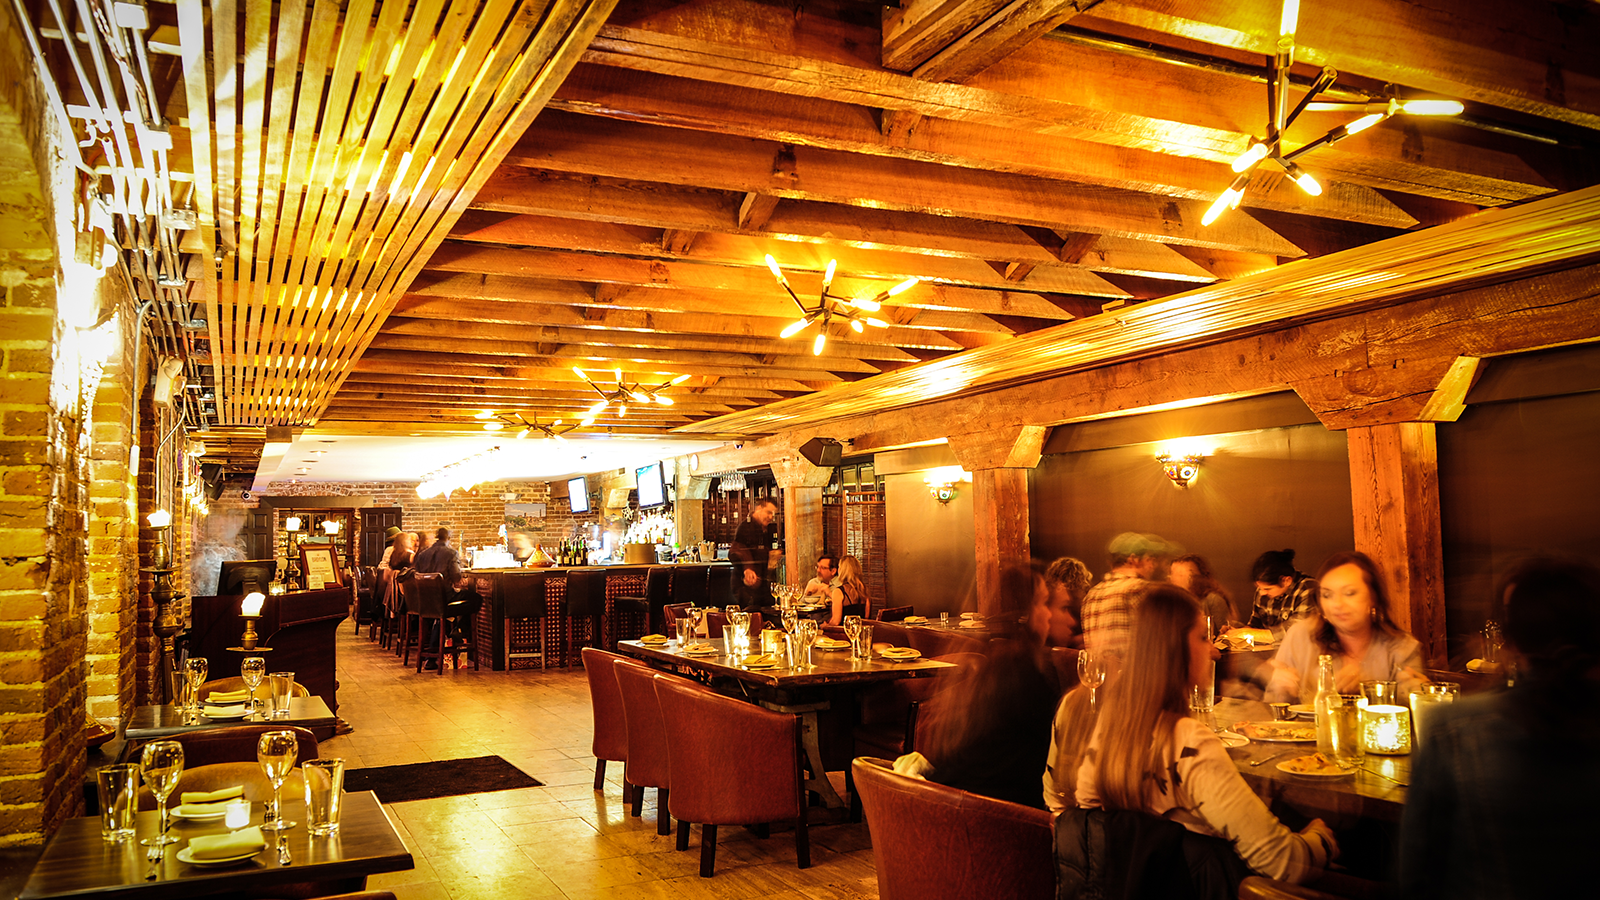 Mulino Italian Kitchen and Bar - Italian Restaurant in Raleigh - Indoor dining